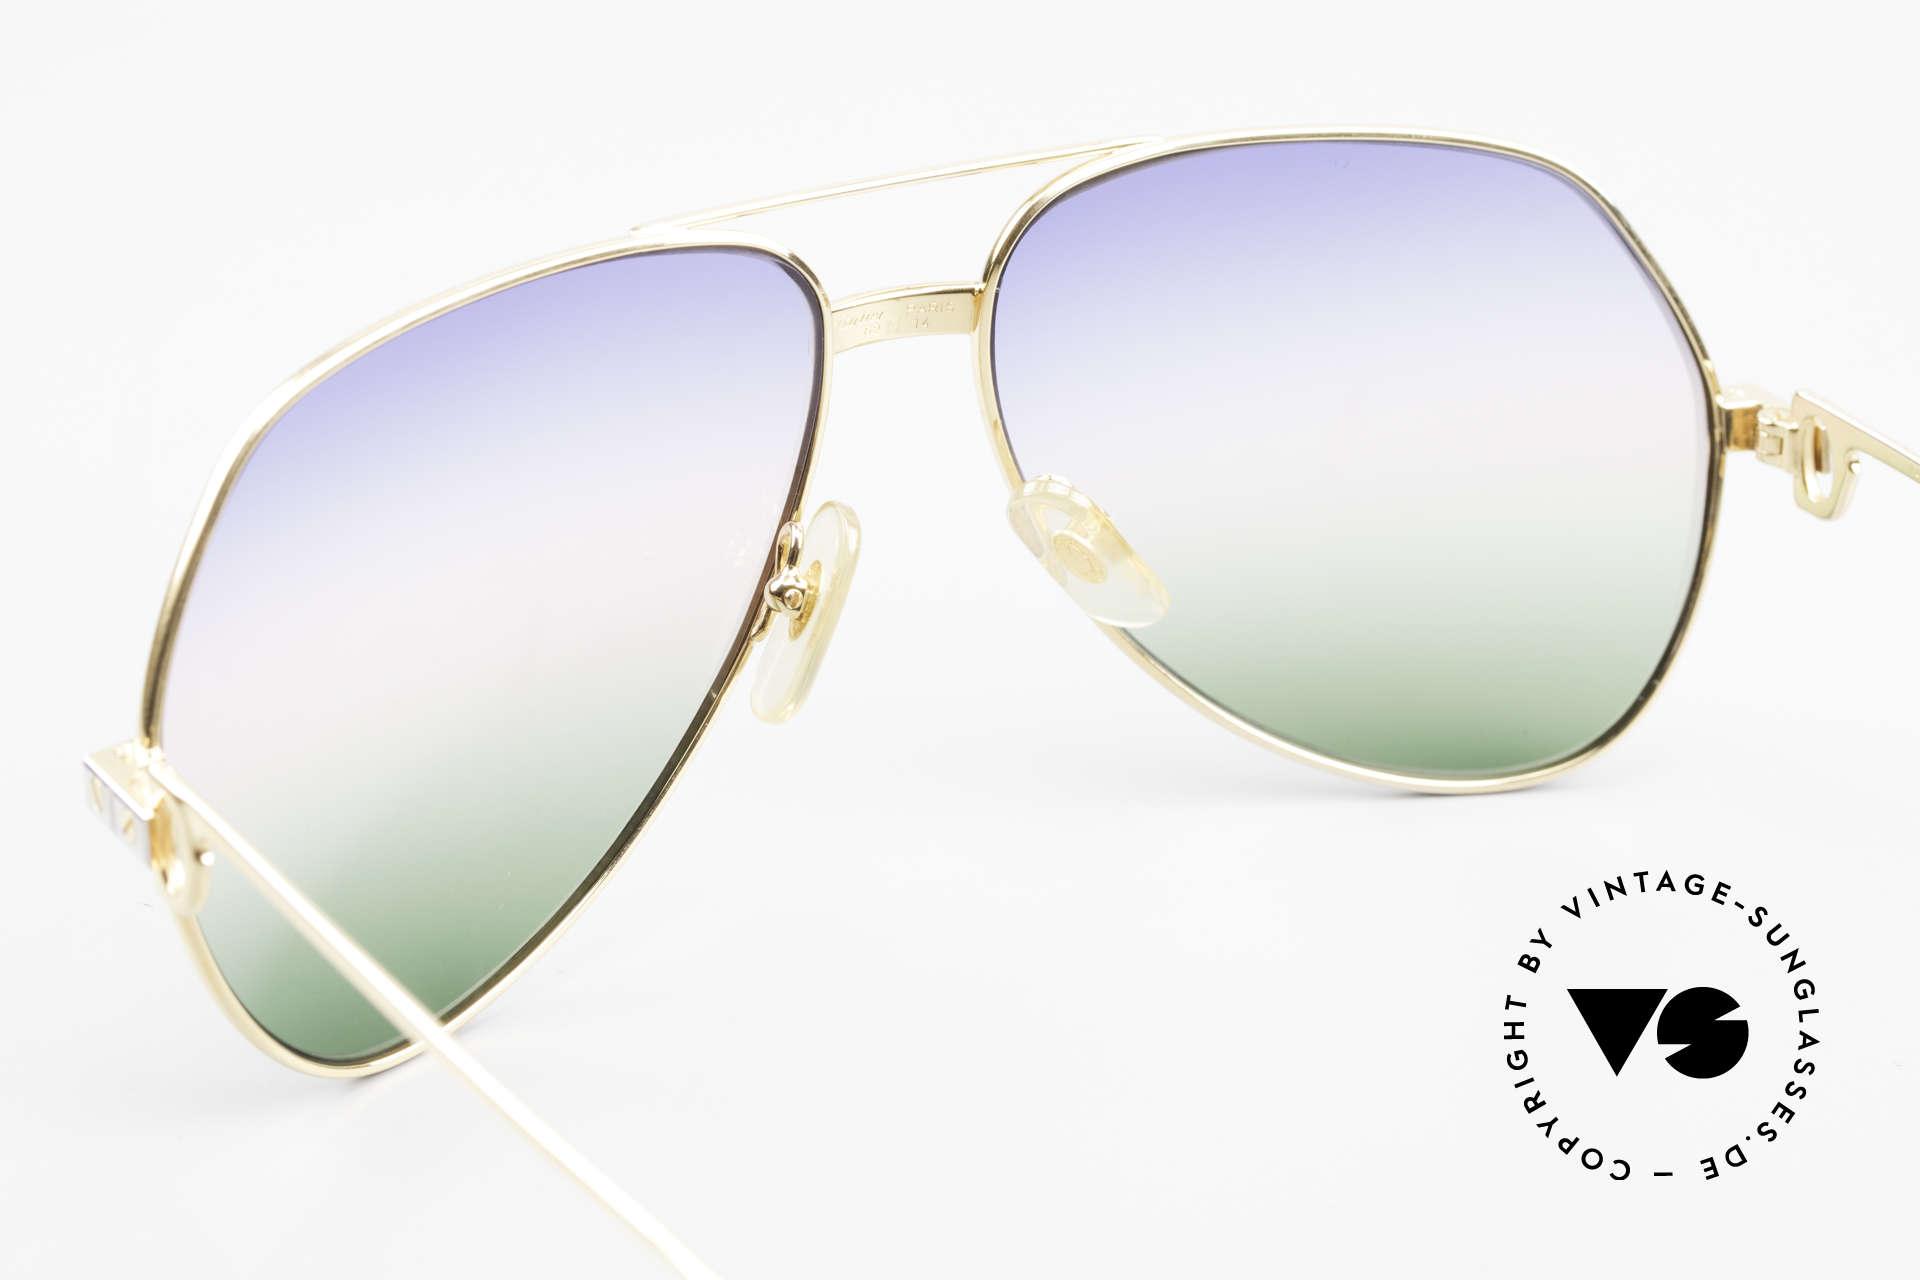 Cartier Vendome Santos - L Rare Luxury 80's Sunglasses, worn by actor Christopher Walken (JAMES BOND, 1985), Made for Men